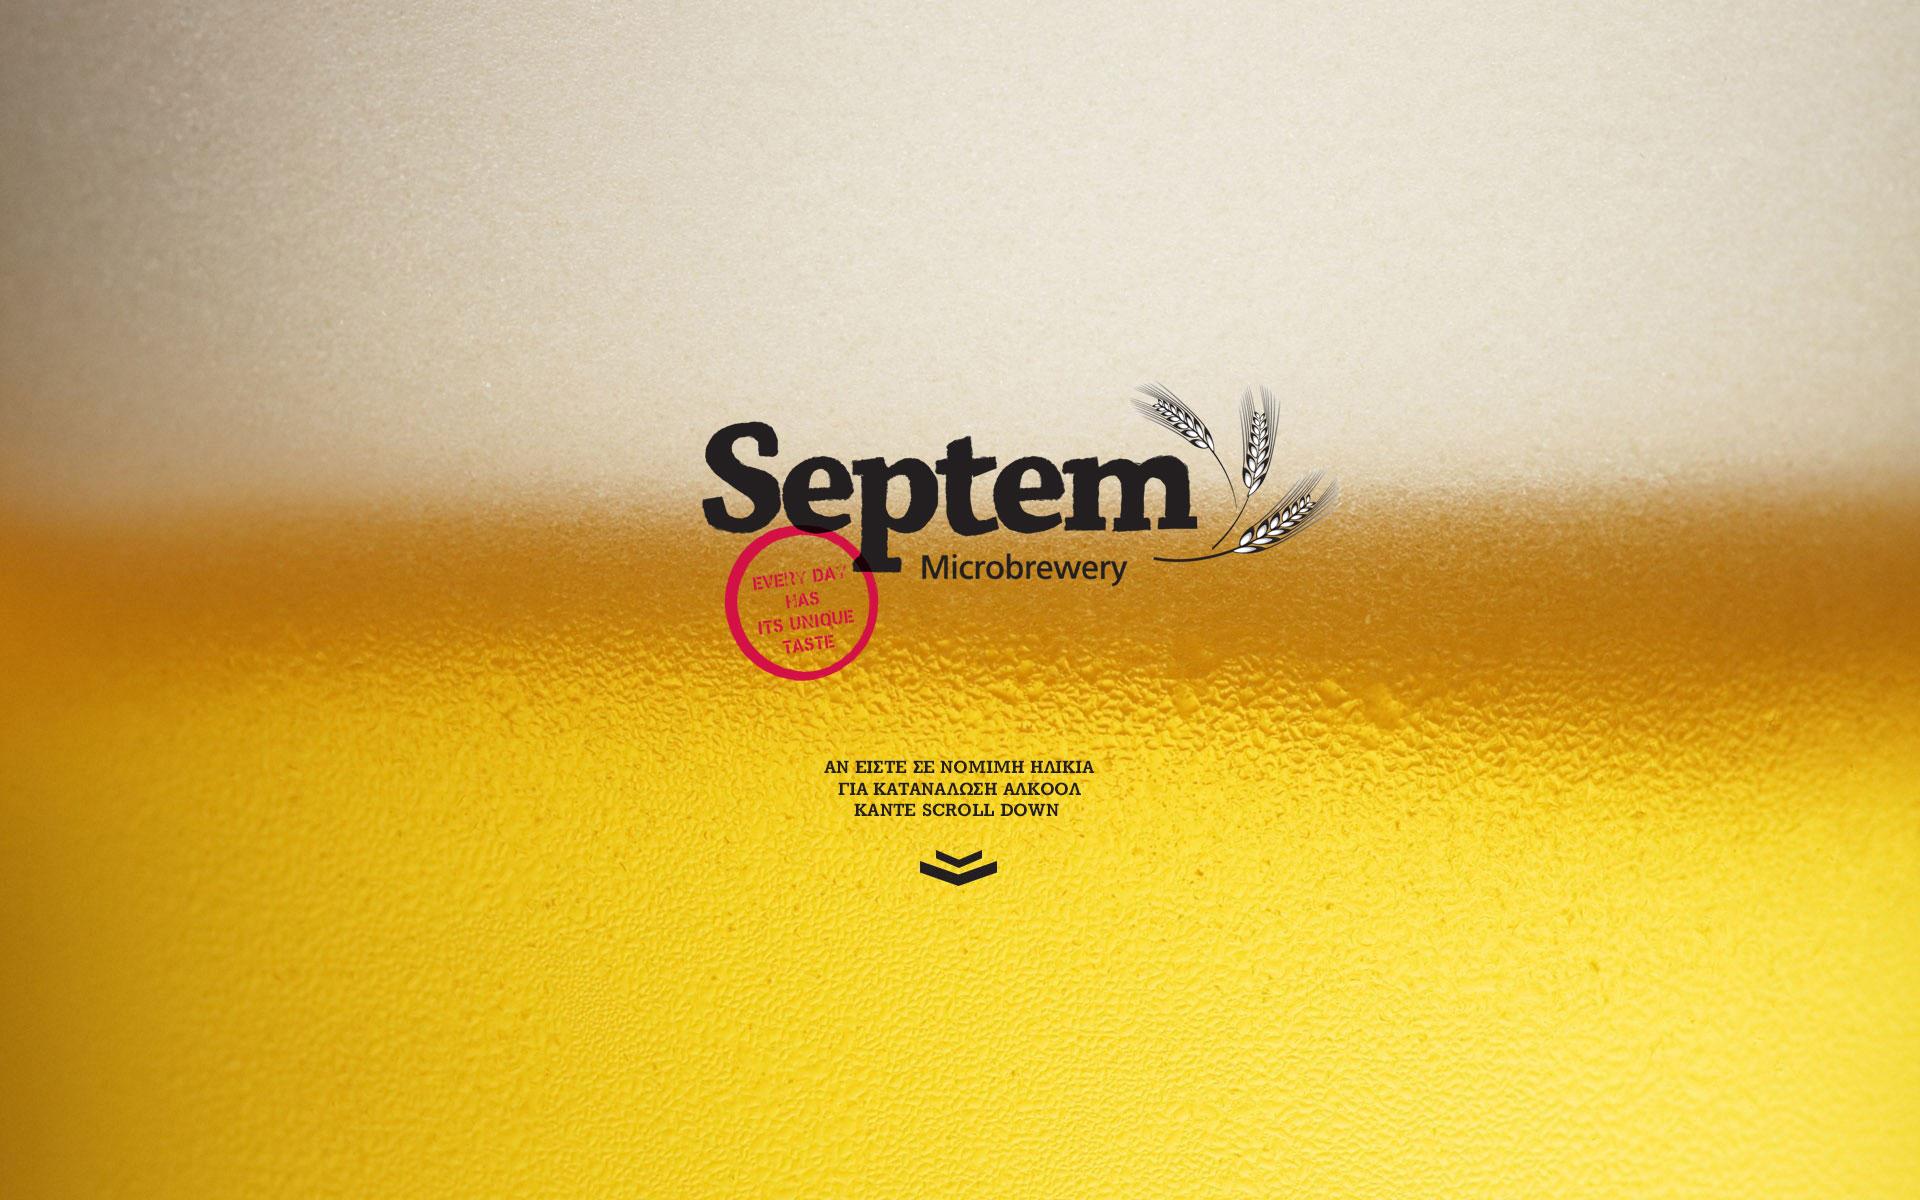 Septem Microbrewery - Legal Age Disclaimer